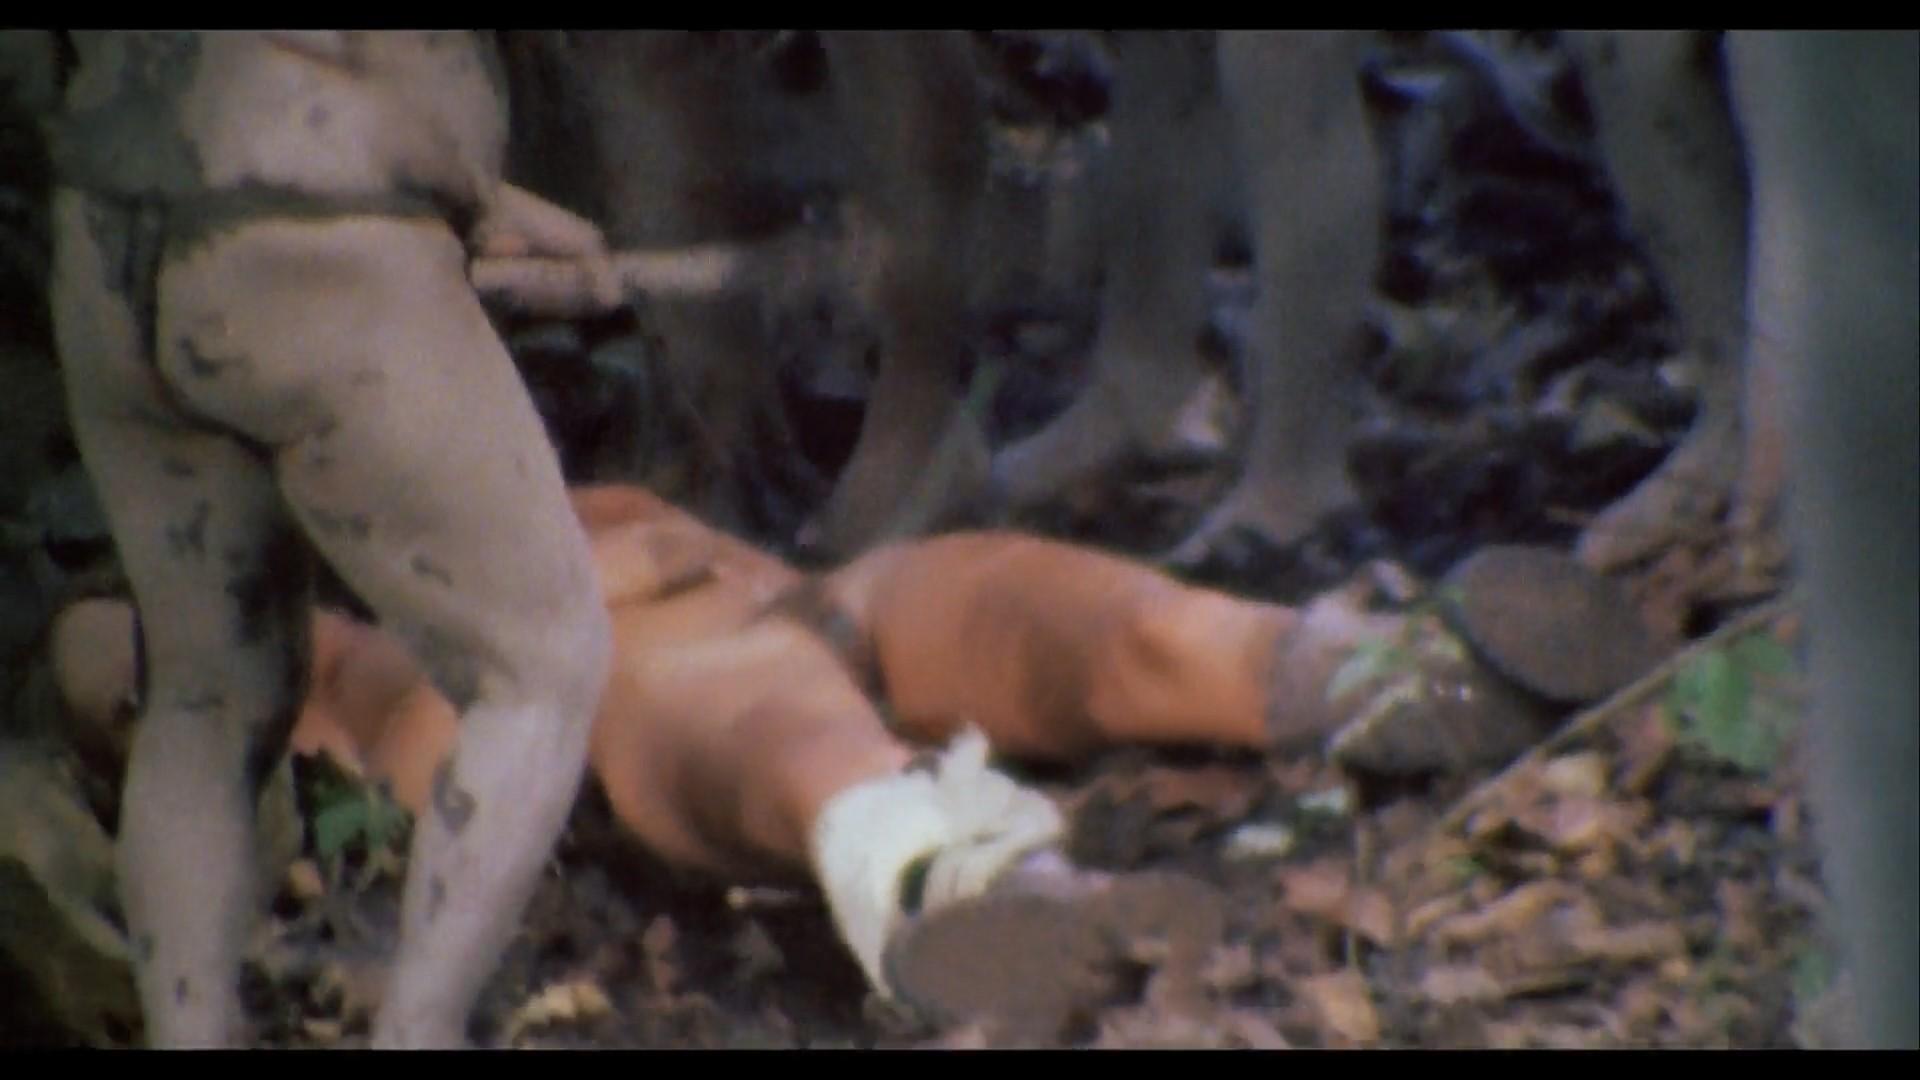 kannibalen holocaust, francesca ciardi nackt